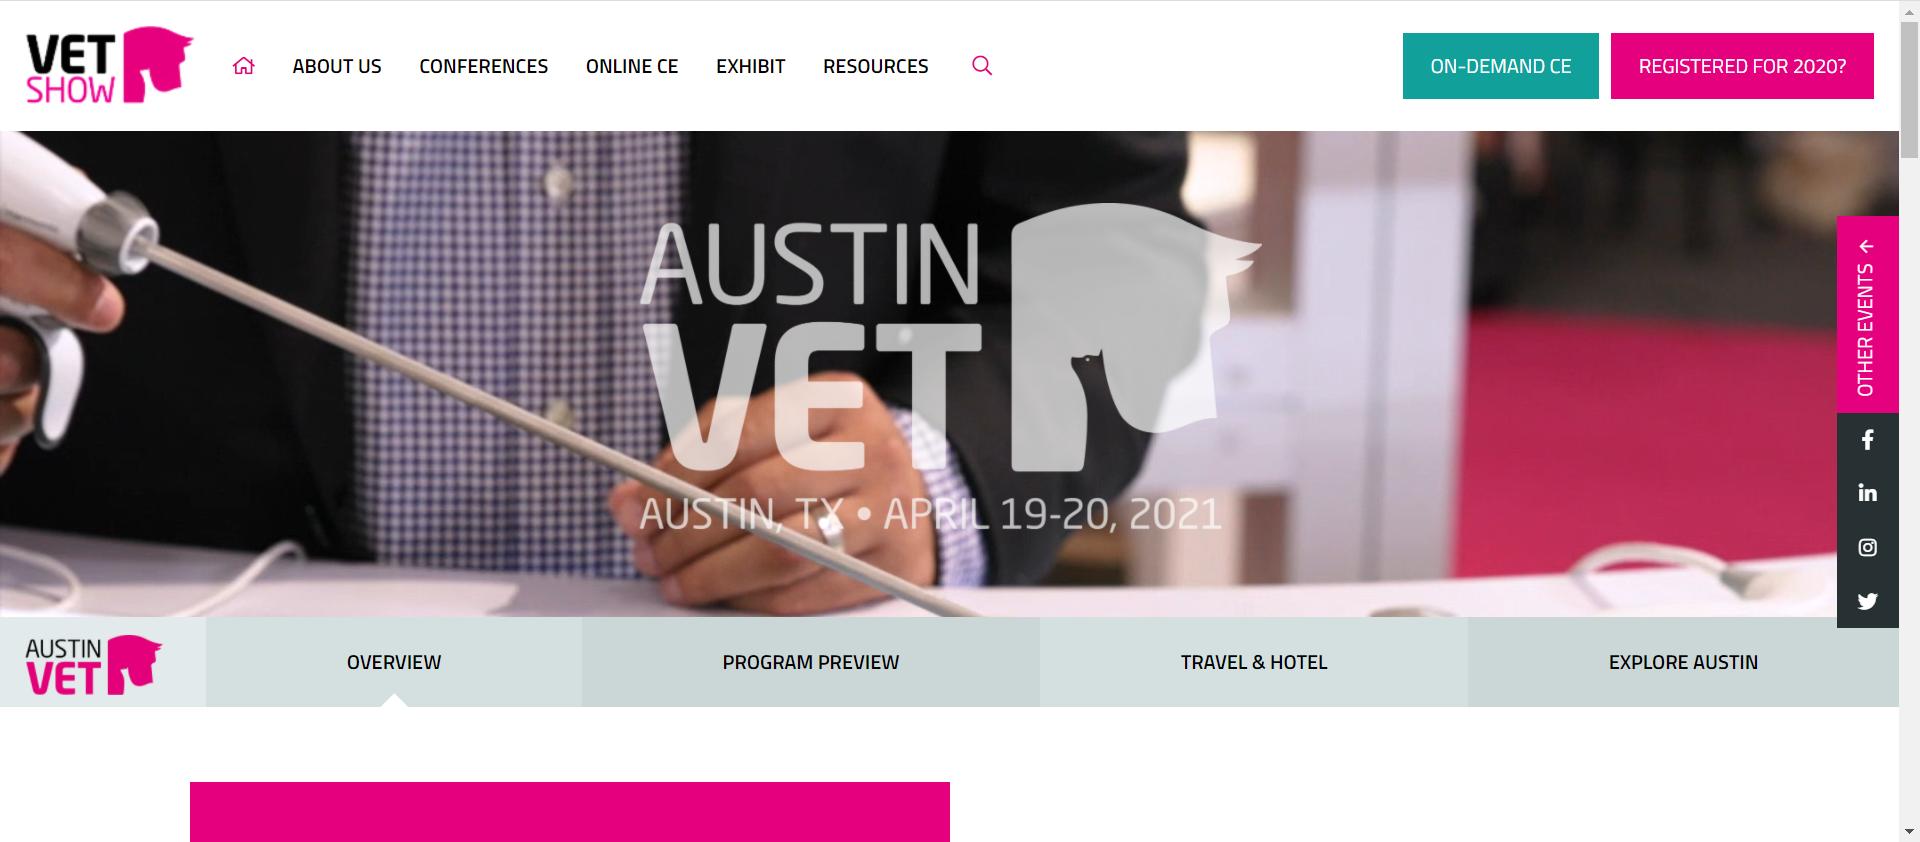 Austin Vet Show